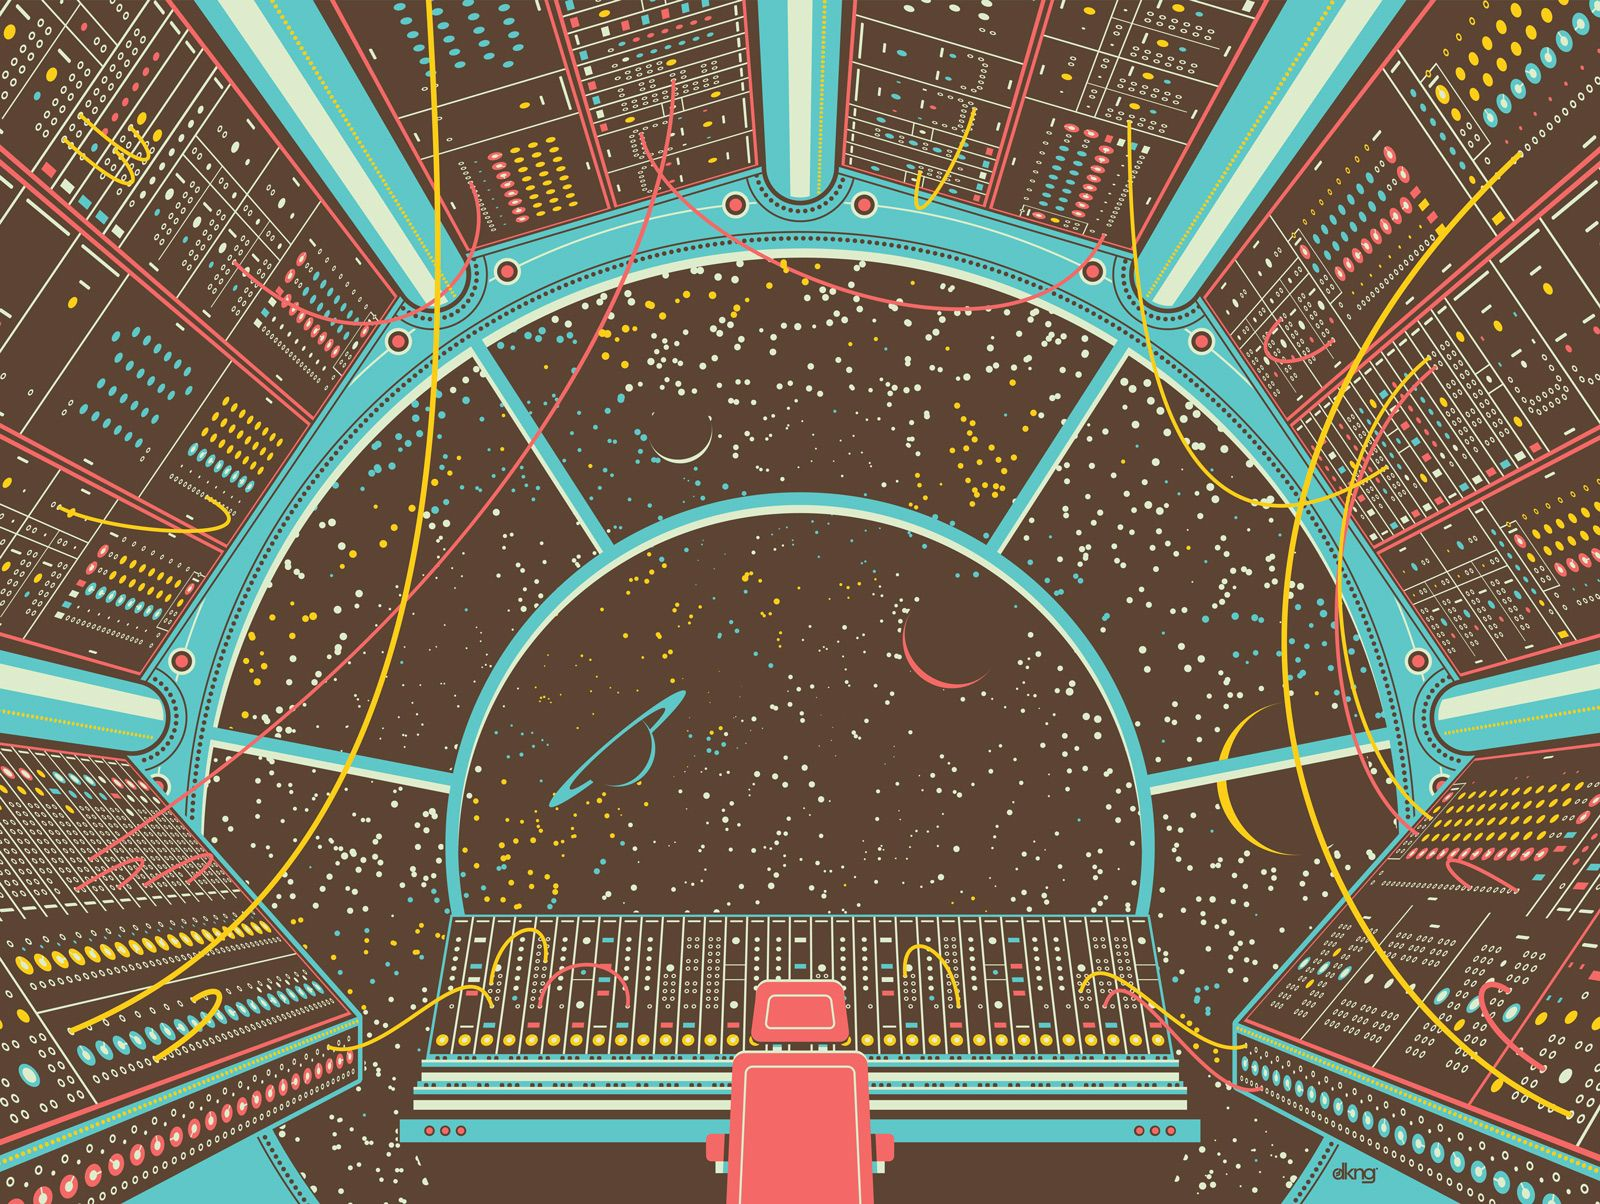 moog modular hd extraordinary - photo #20